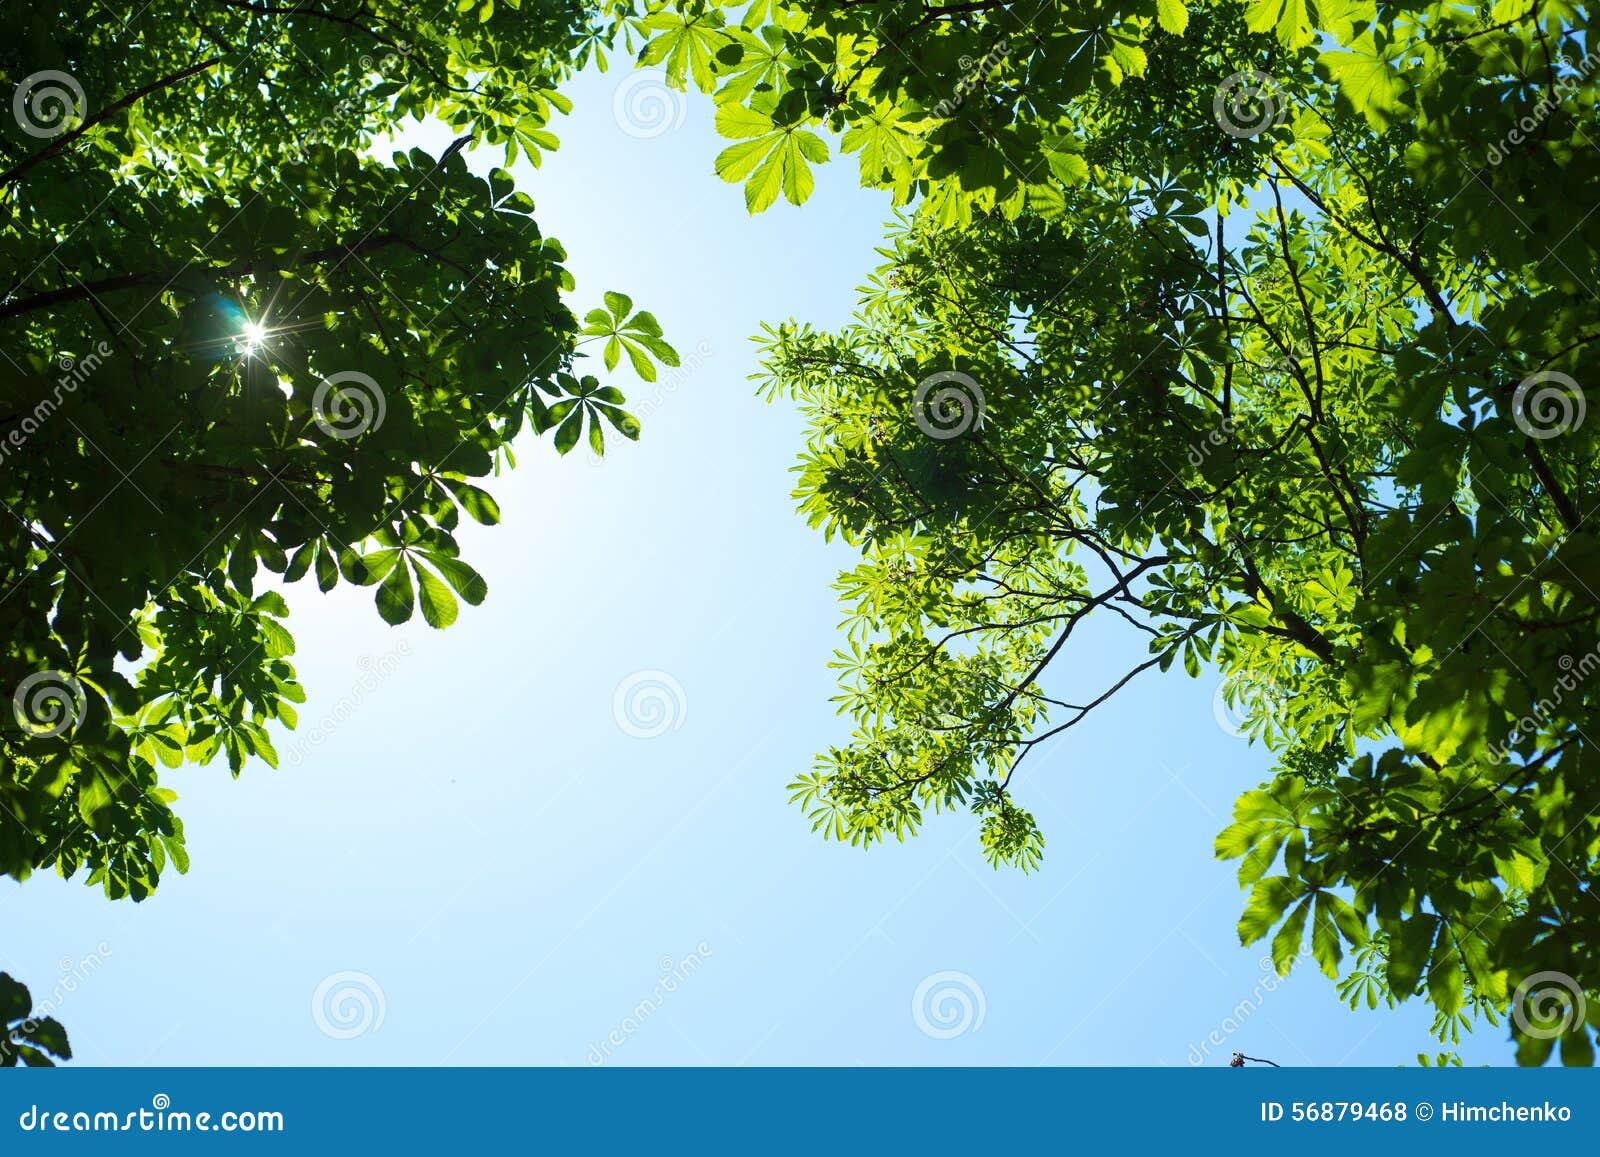 Fondo di fogliame e di cielo blu verdi